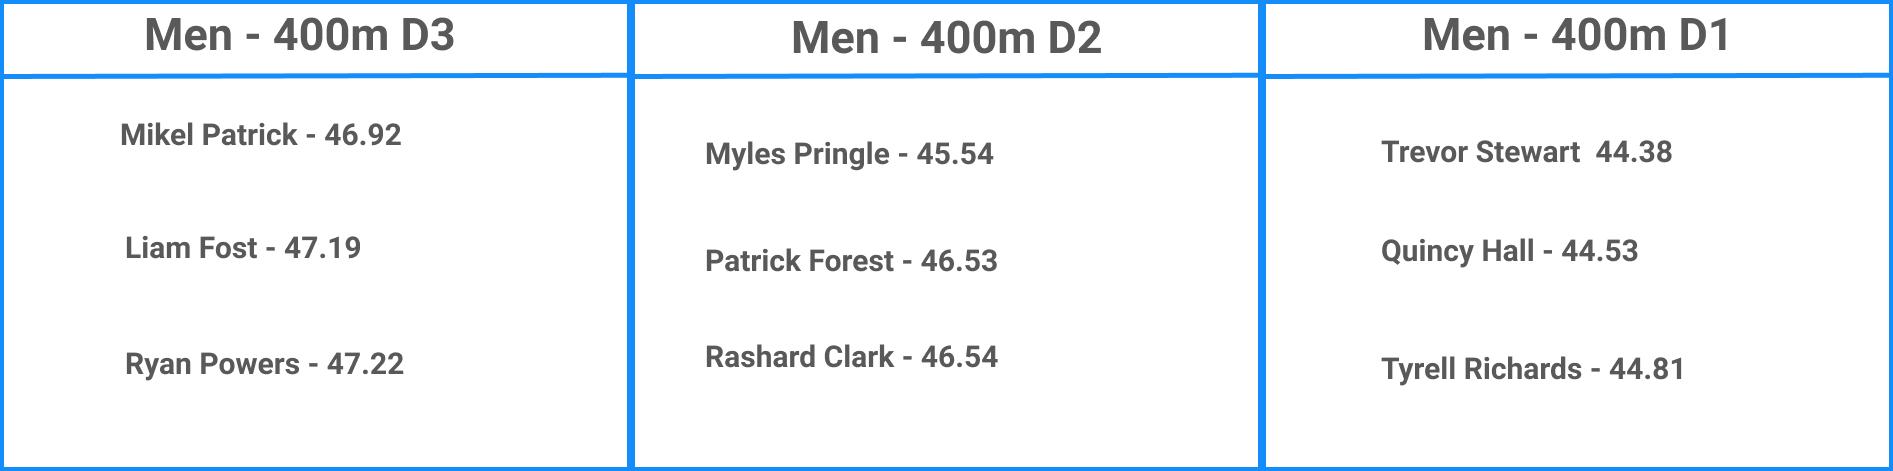 Top NCAA Men's 400m Performances